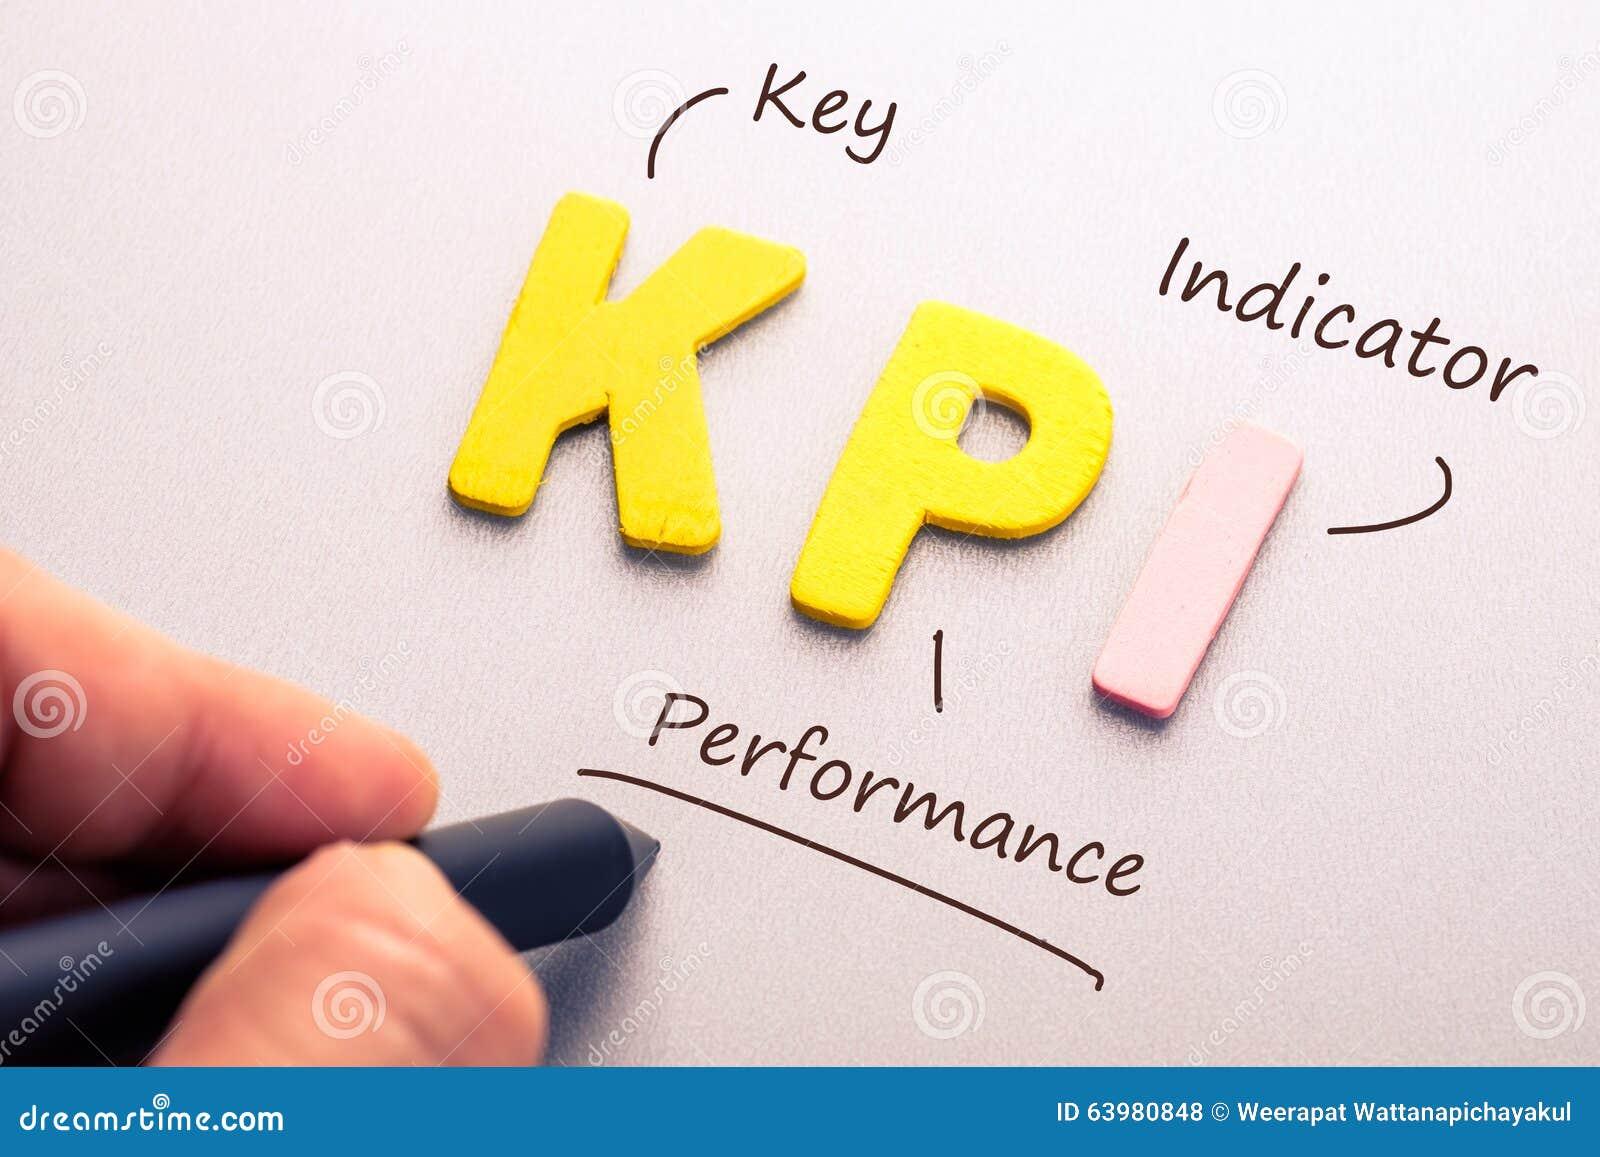 Kpi stock photo image 63980848 Define calligraphy